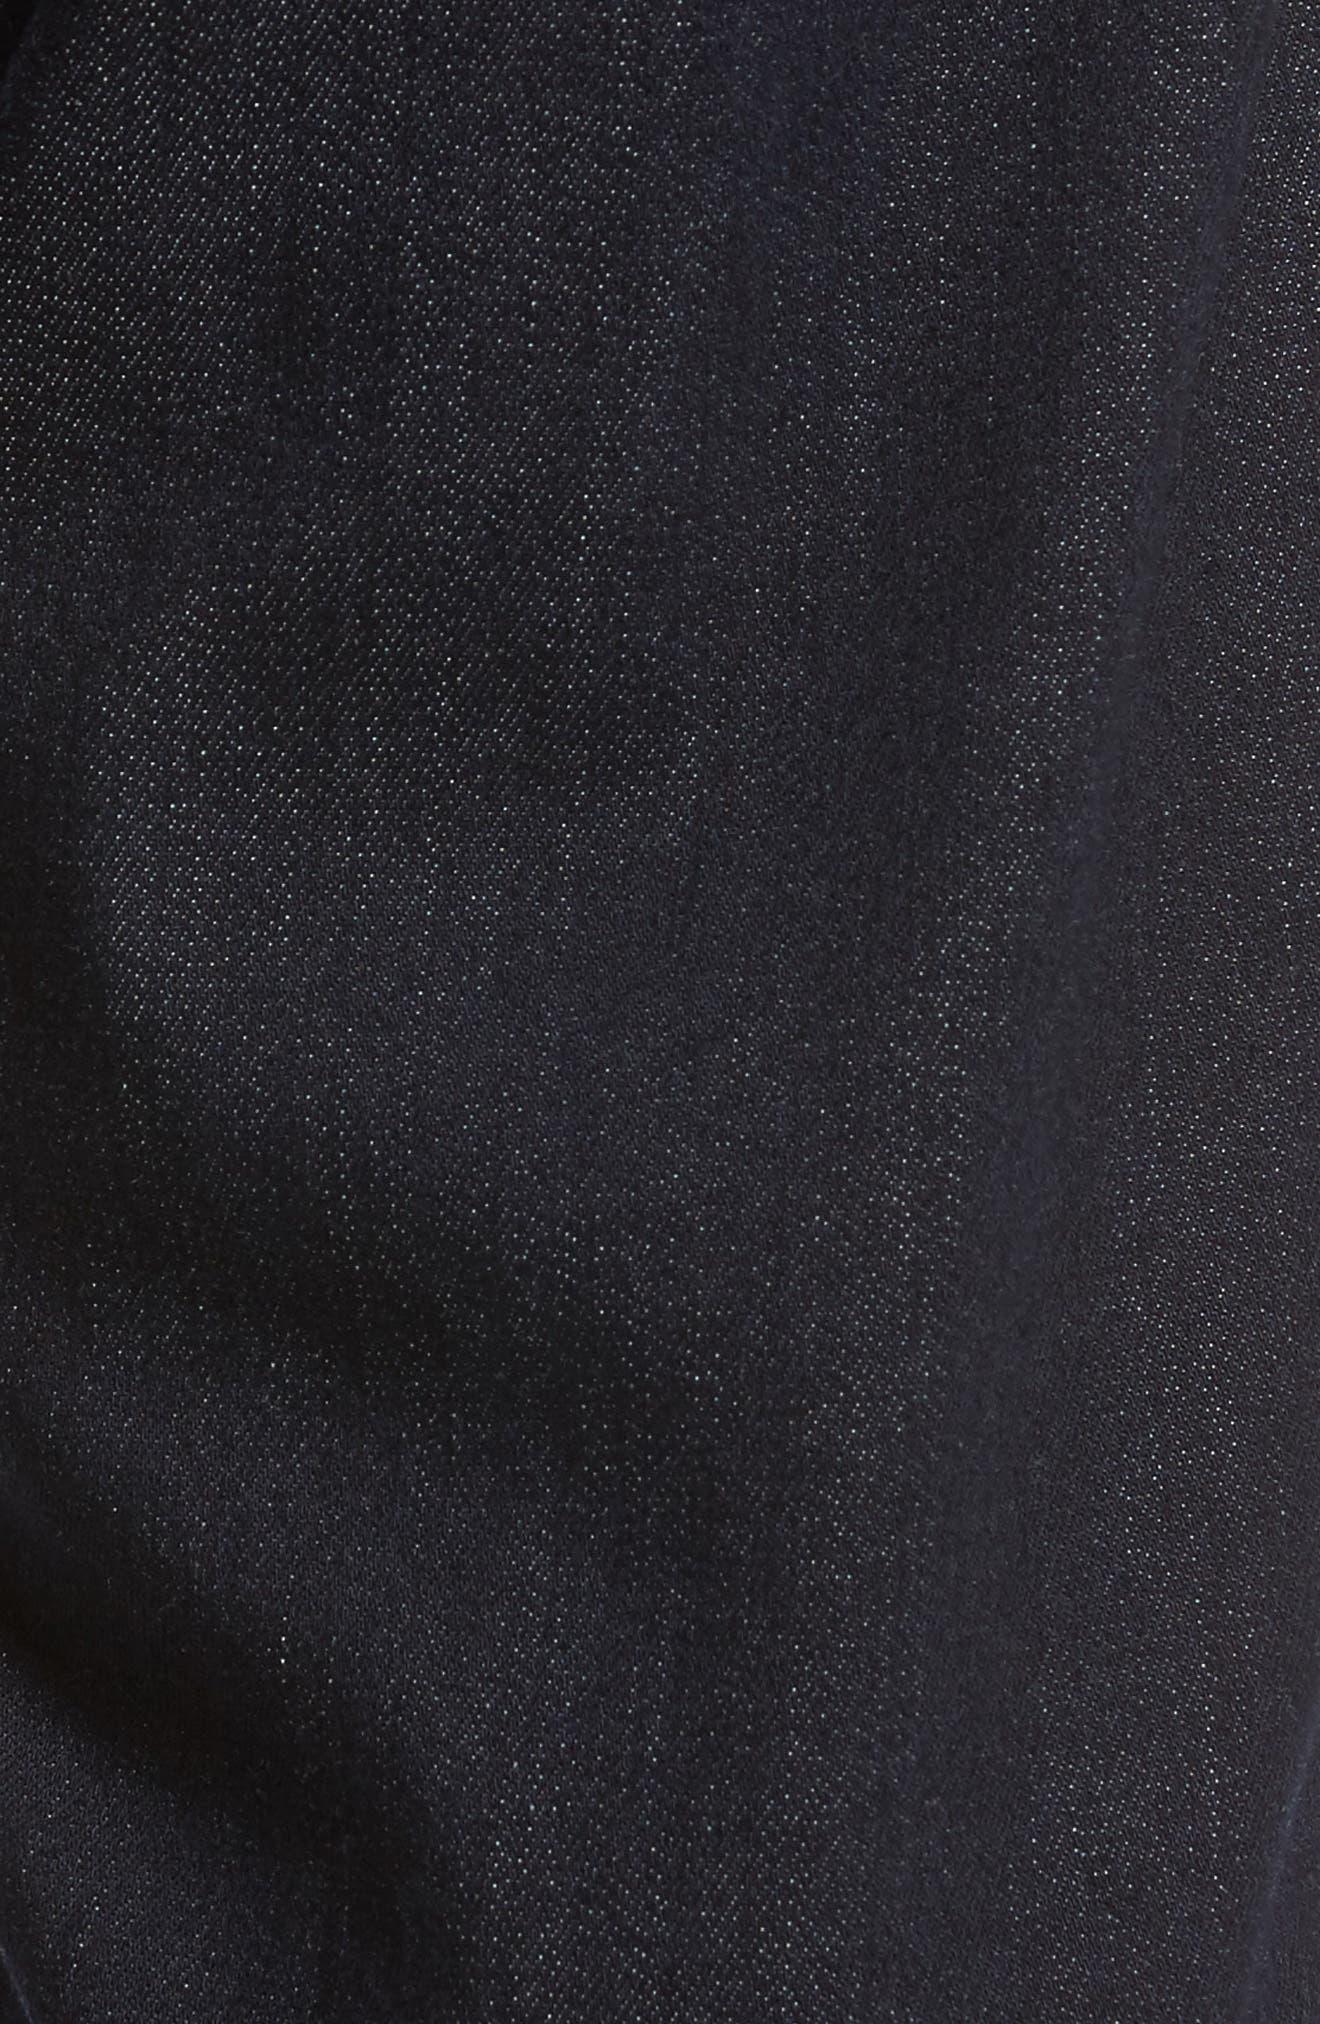 Matt Relaxed Fit Jeans,                             Alternate thumbnail 5, color,                             401